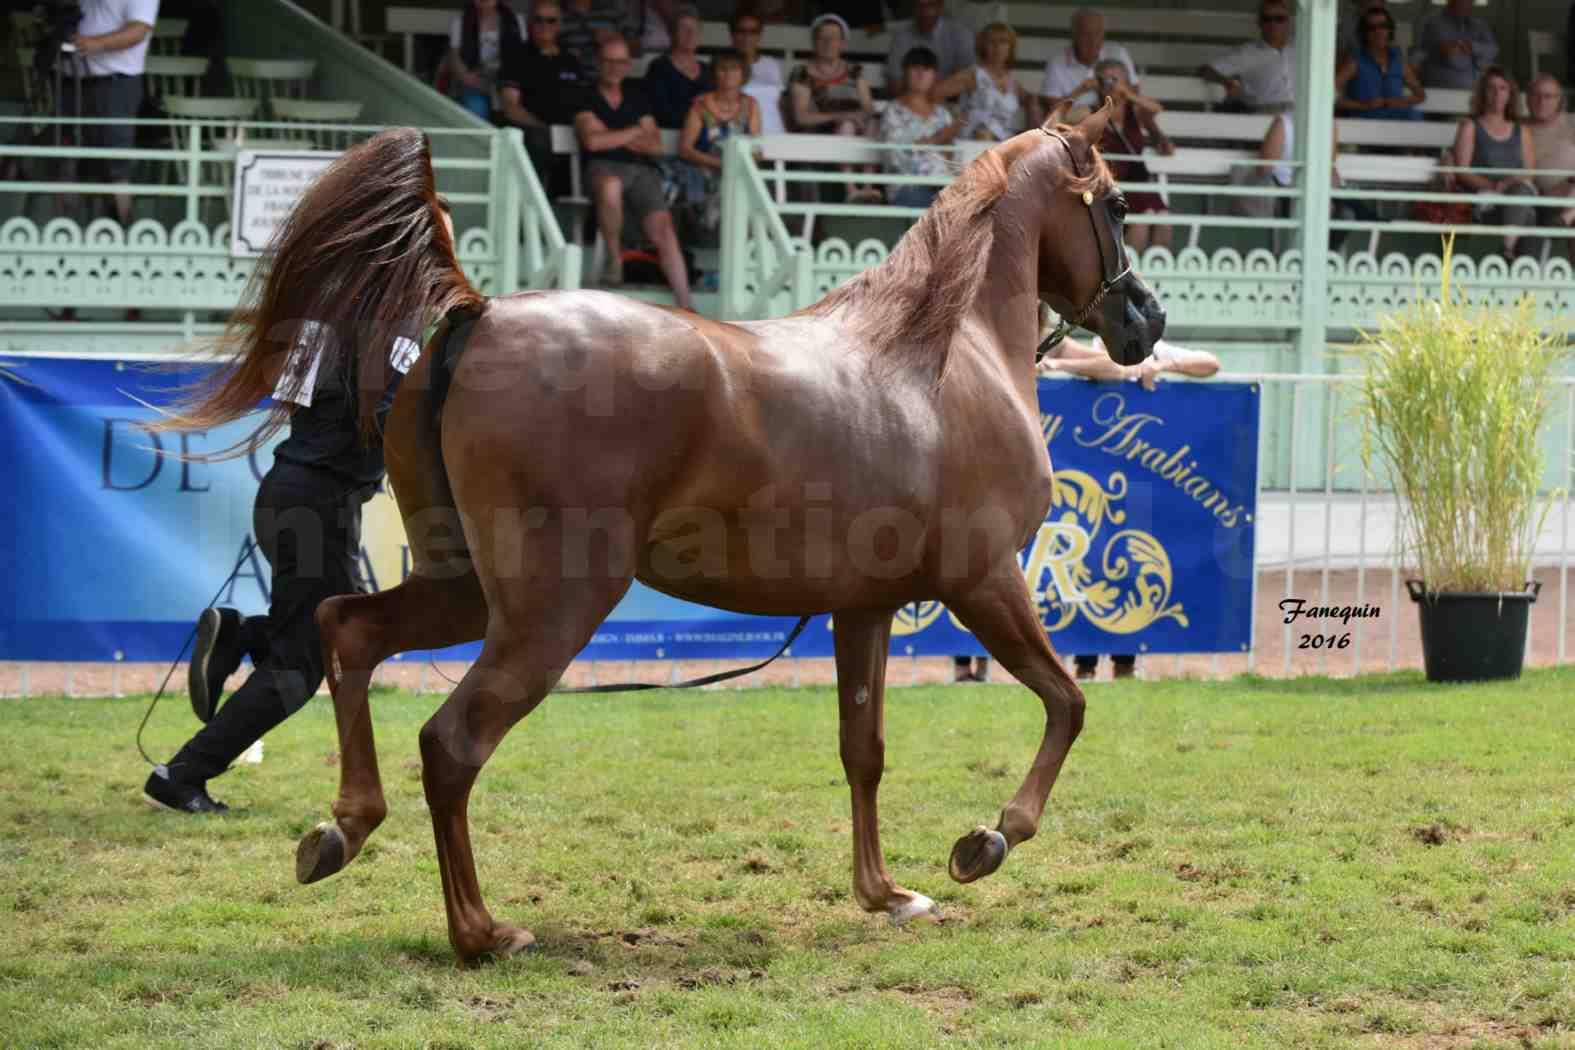 International Arabian Horse Show B de VICHY 2016 - PEARL DE DJOON - Notre Sélection - 34